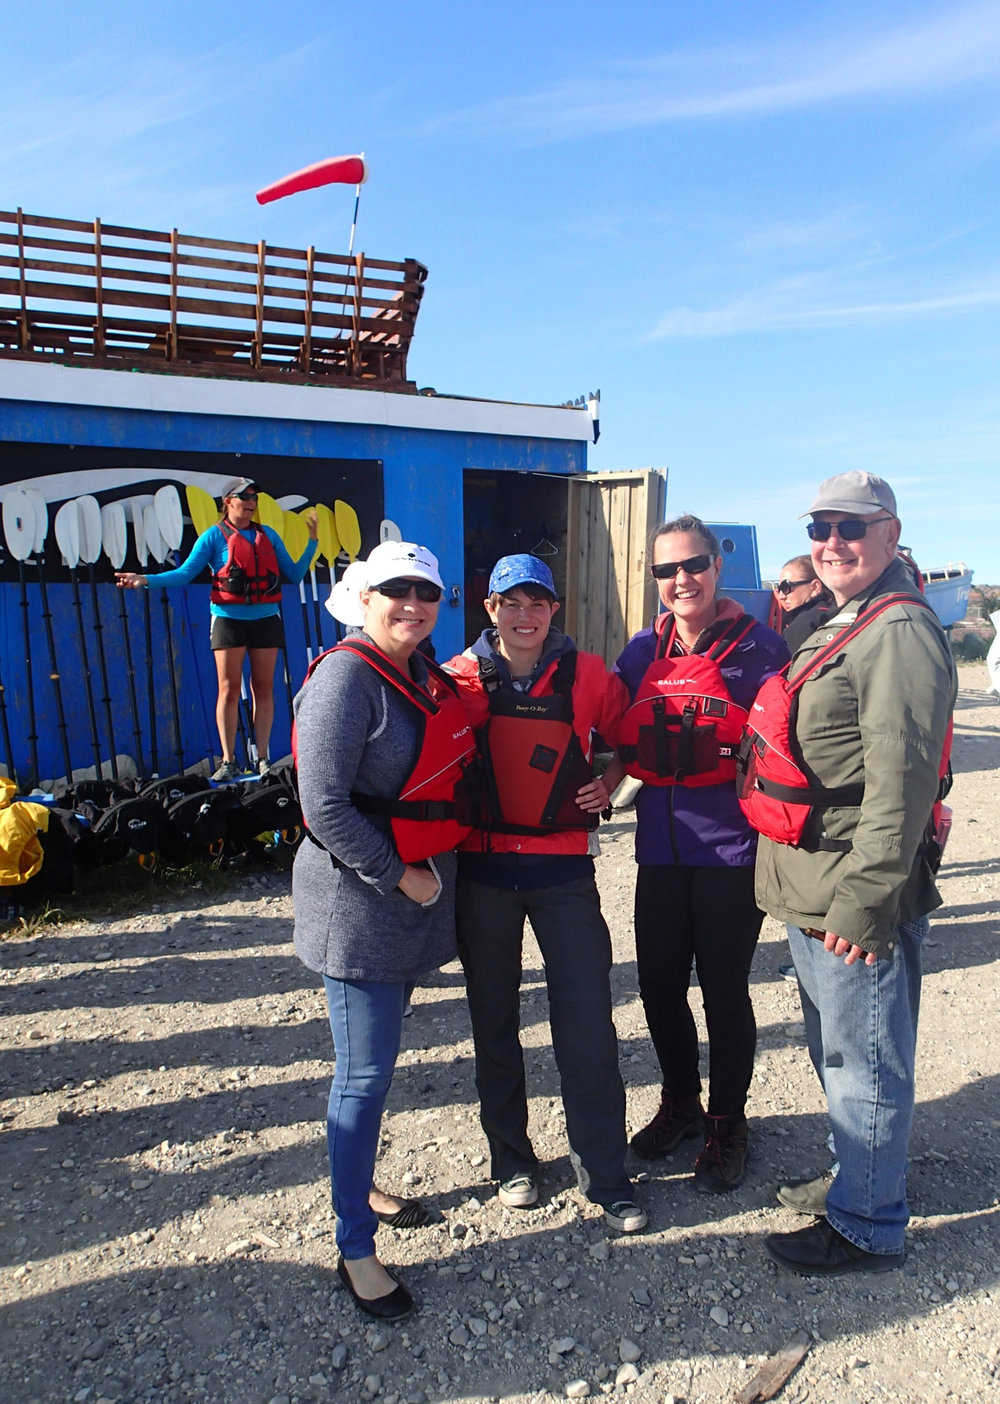 teri_arctic_kayaking_spiritedtable6.jpg